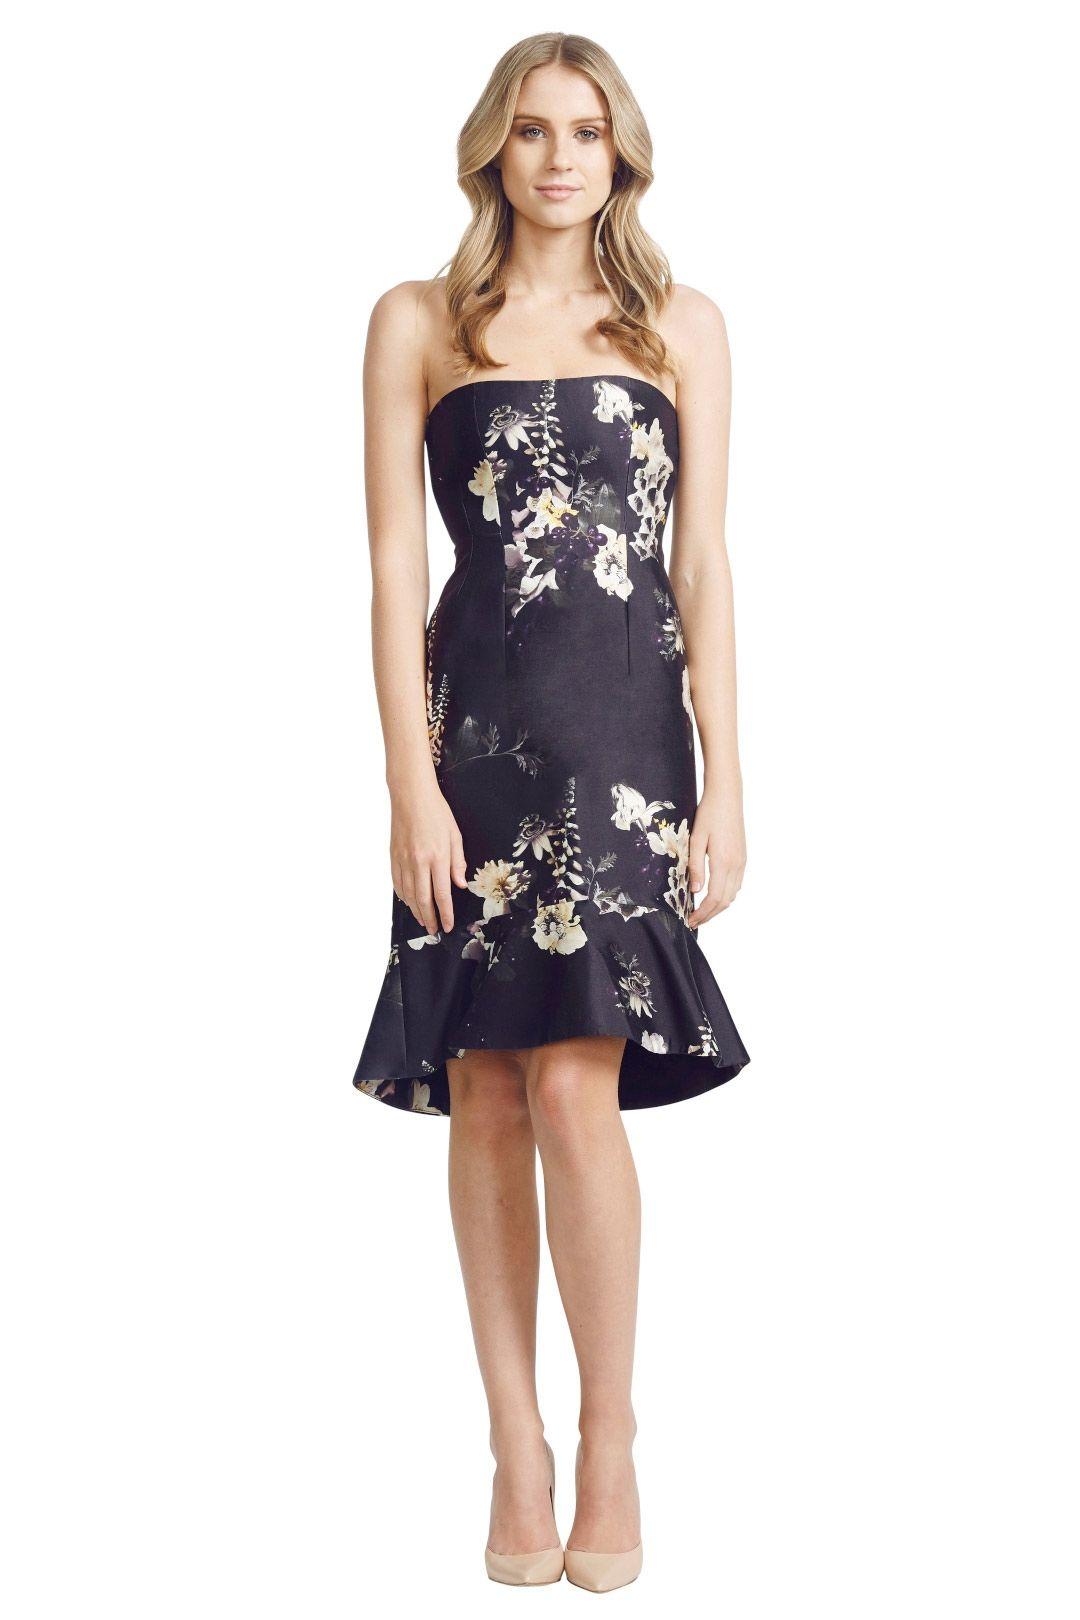 Ellery - Ten Pin Strapless Dress - Black - Front